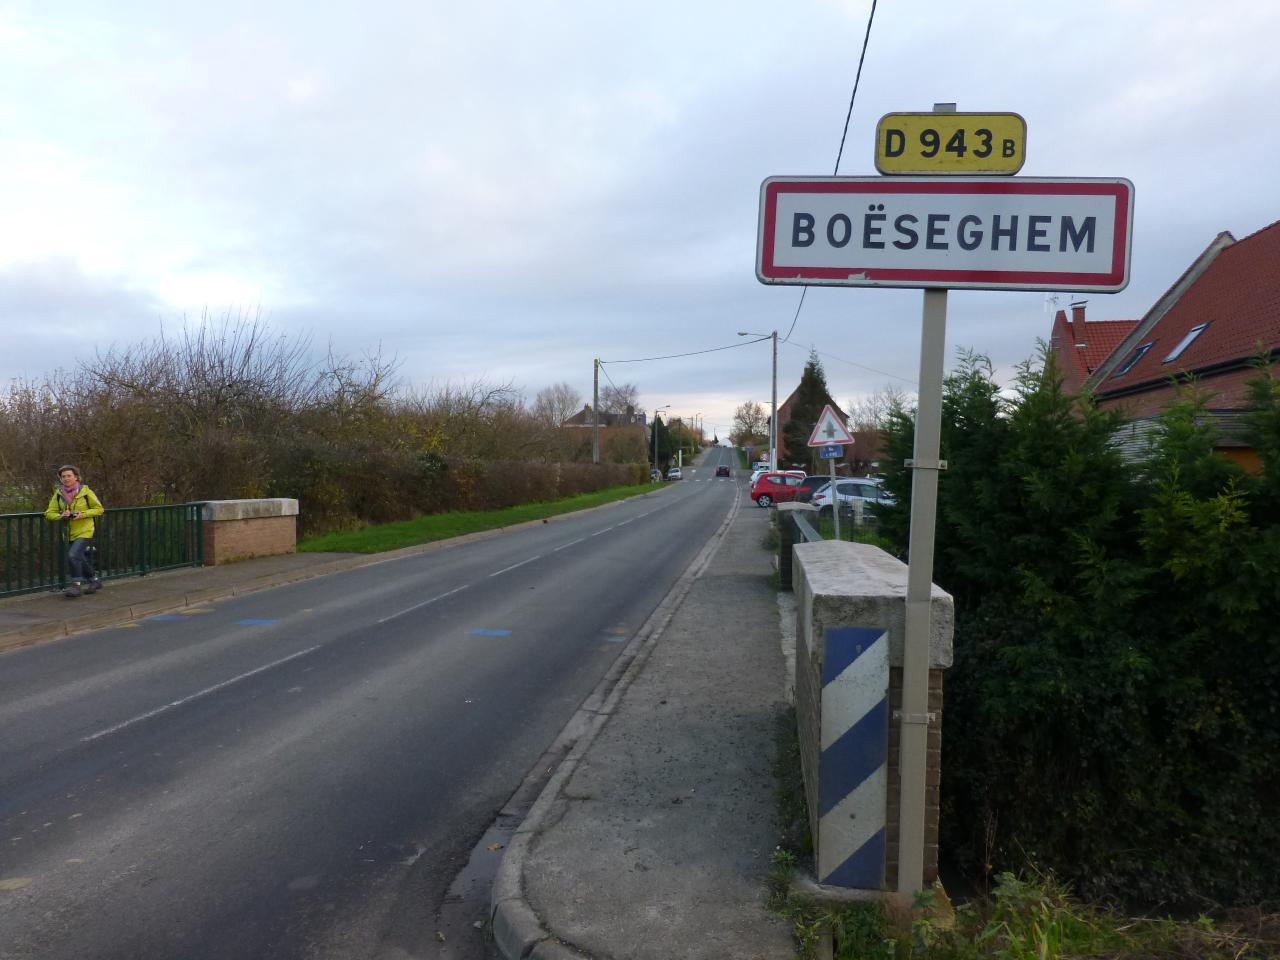 Boeseghem 6 decembre 2015